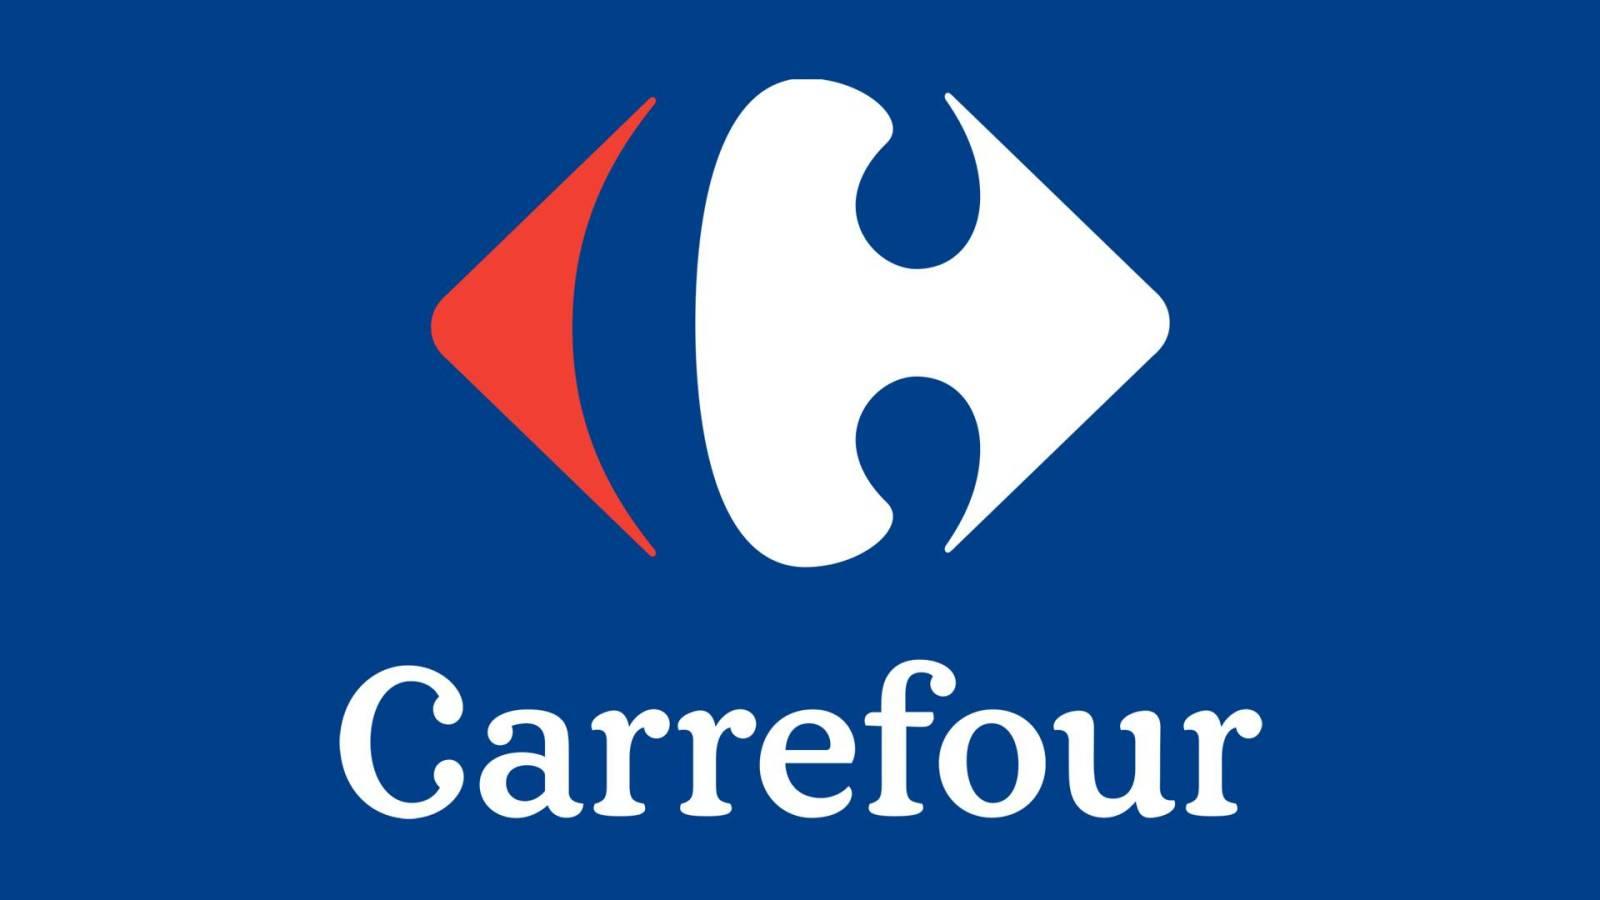 Carrefour casnic